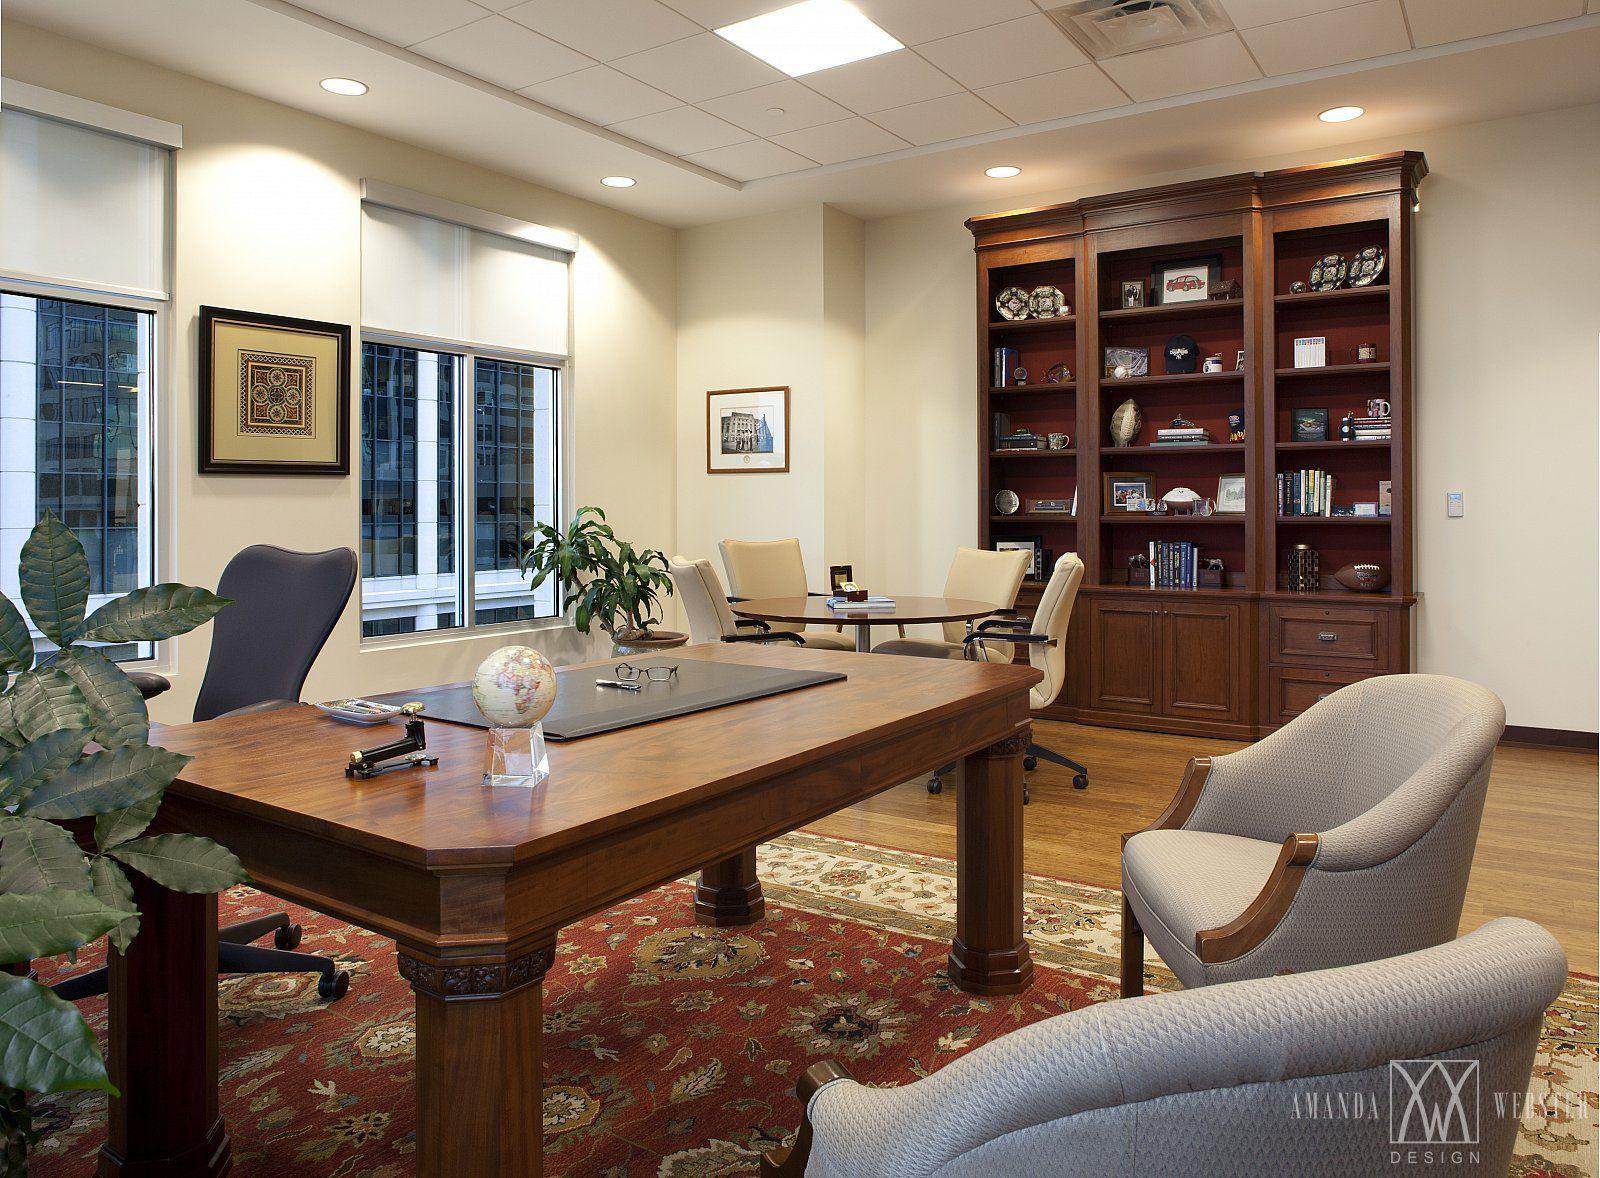 Amanda Webster Design: Commercial Interior Design   DuPont Testamentary  Trust / Photo By Neil Rashba